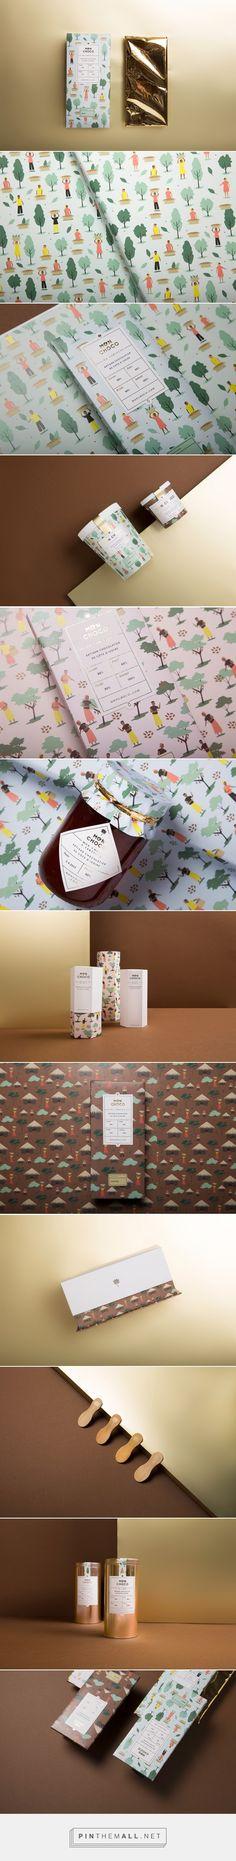 Mon Choco Chocolate packaging design by Futura (Mexico) - http://www.packagingoftheworld.com/2016/05/mon-choco.html